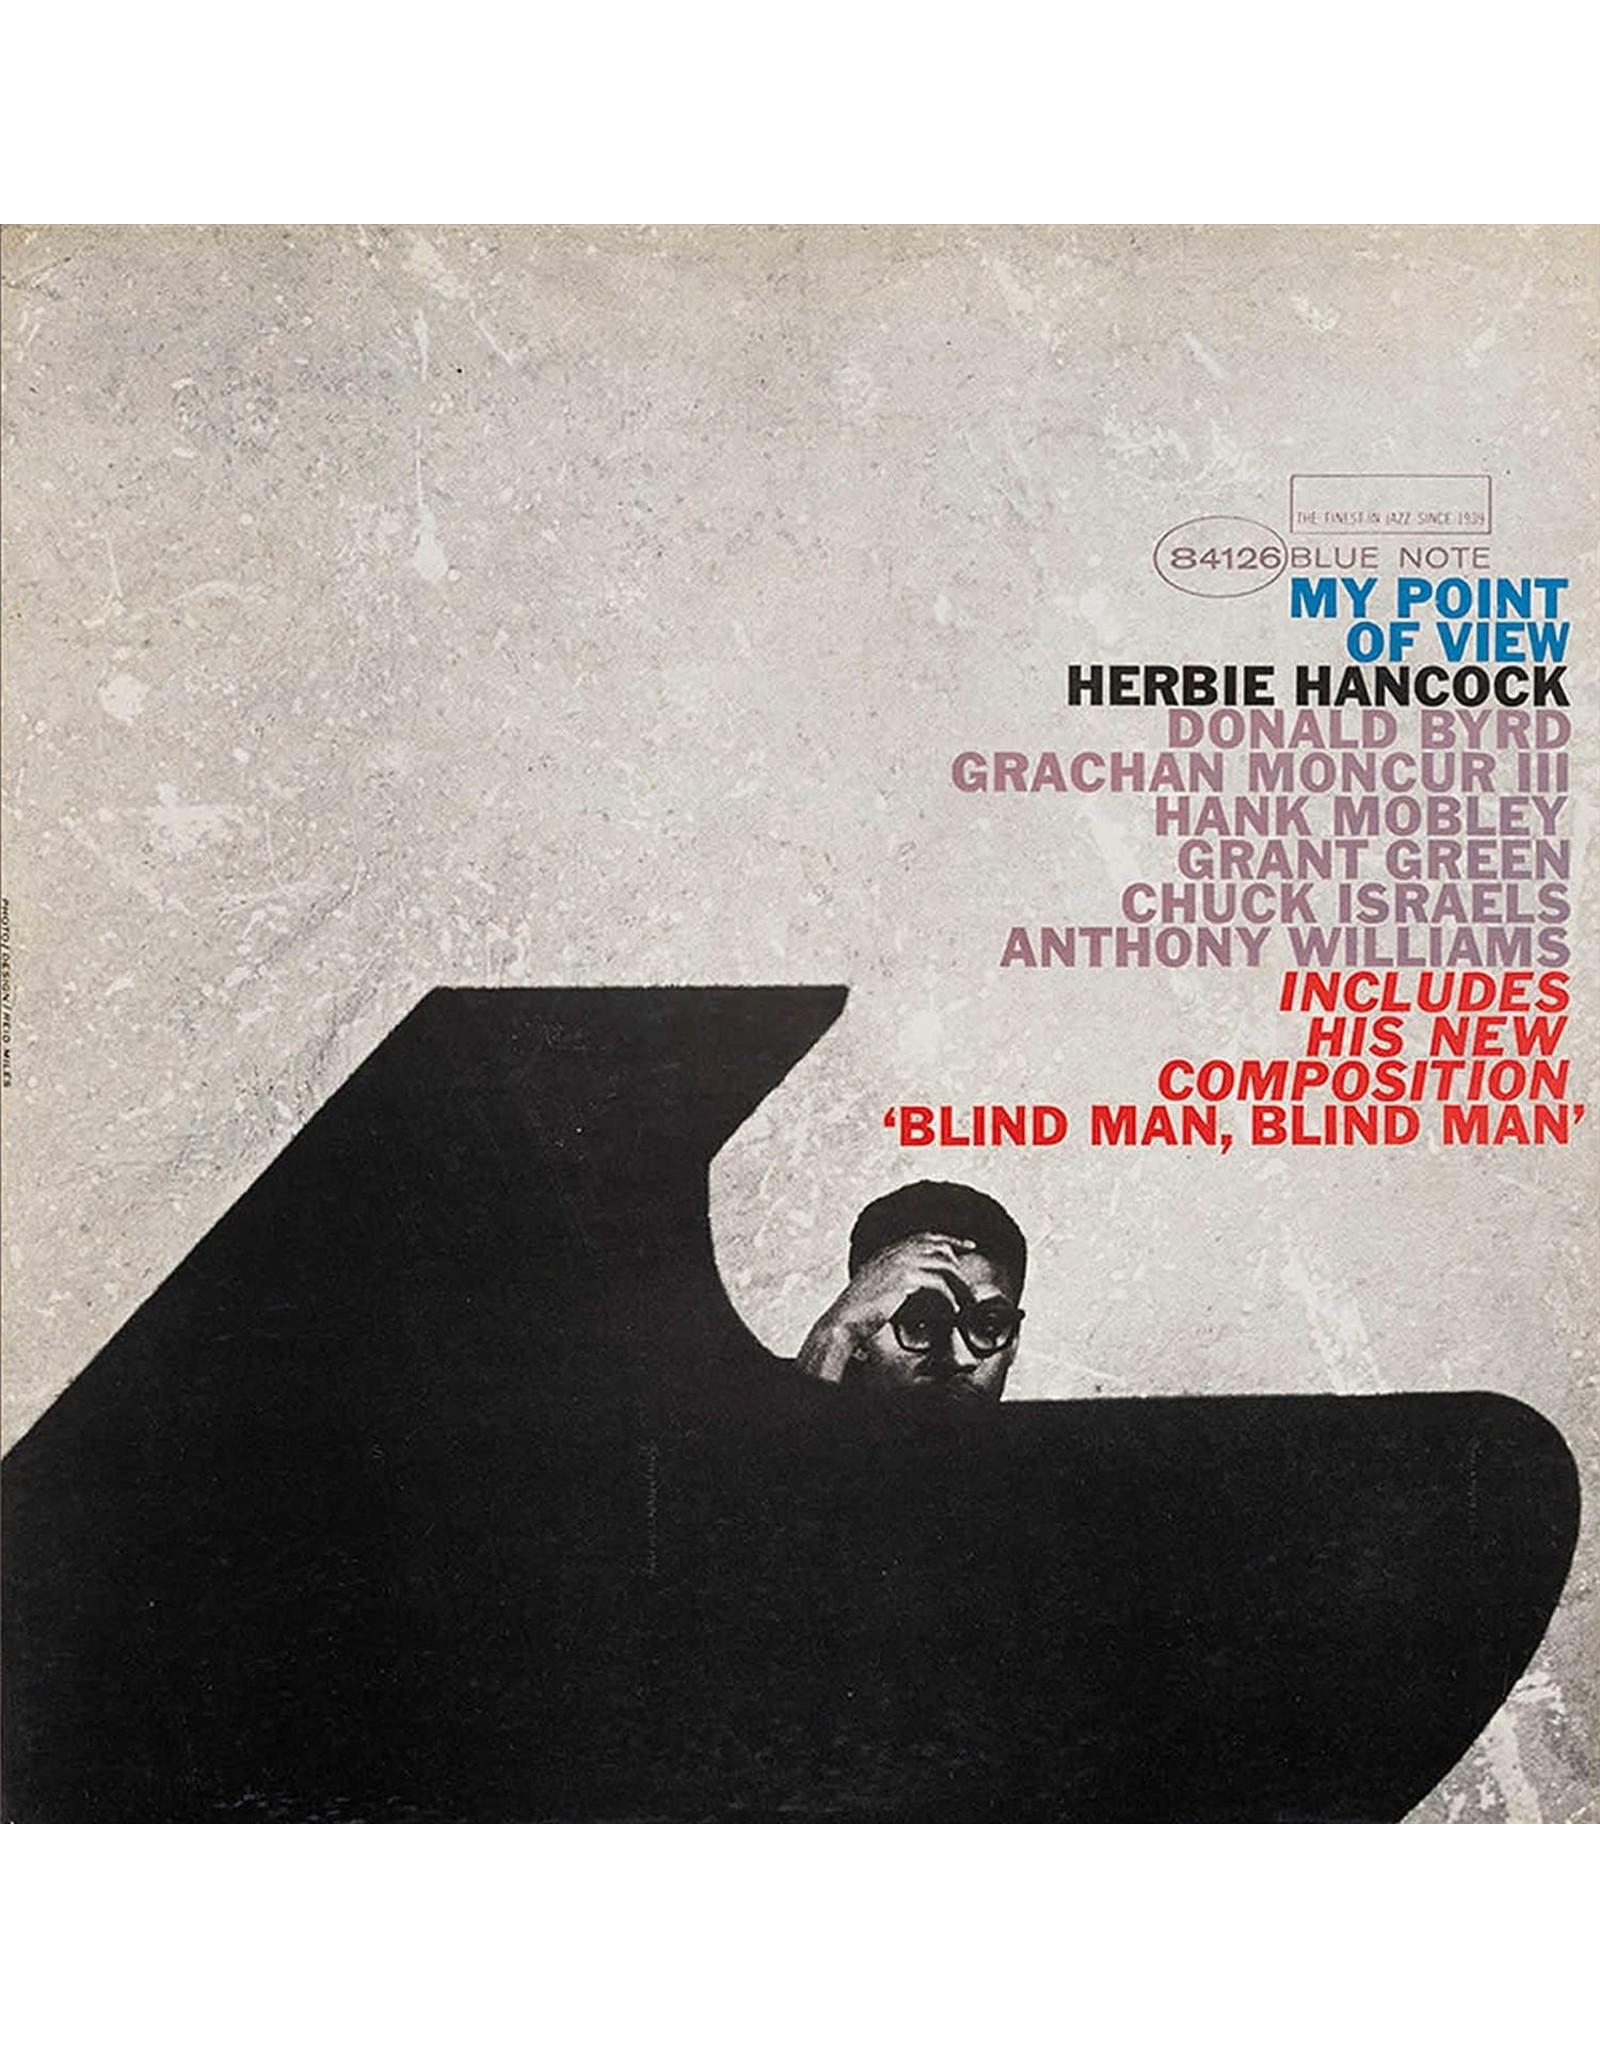 Herbie Hancock - My Point Of View (Blue Note Tone Poet)